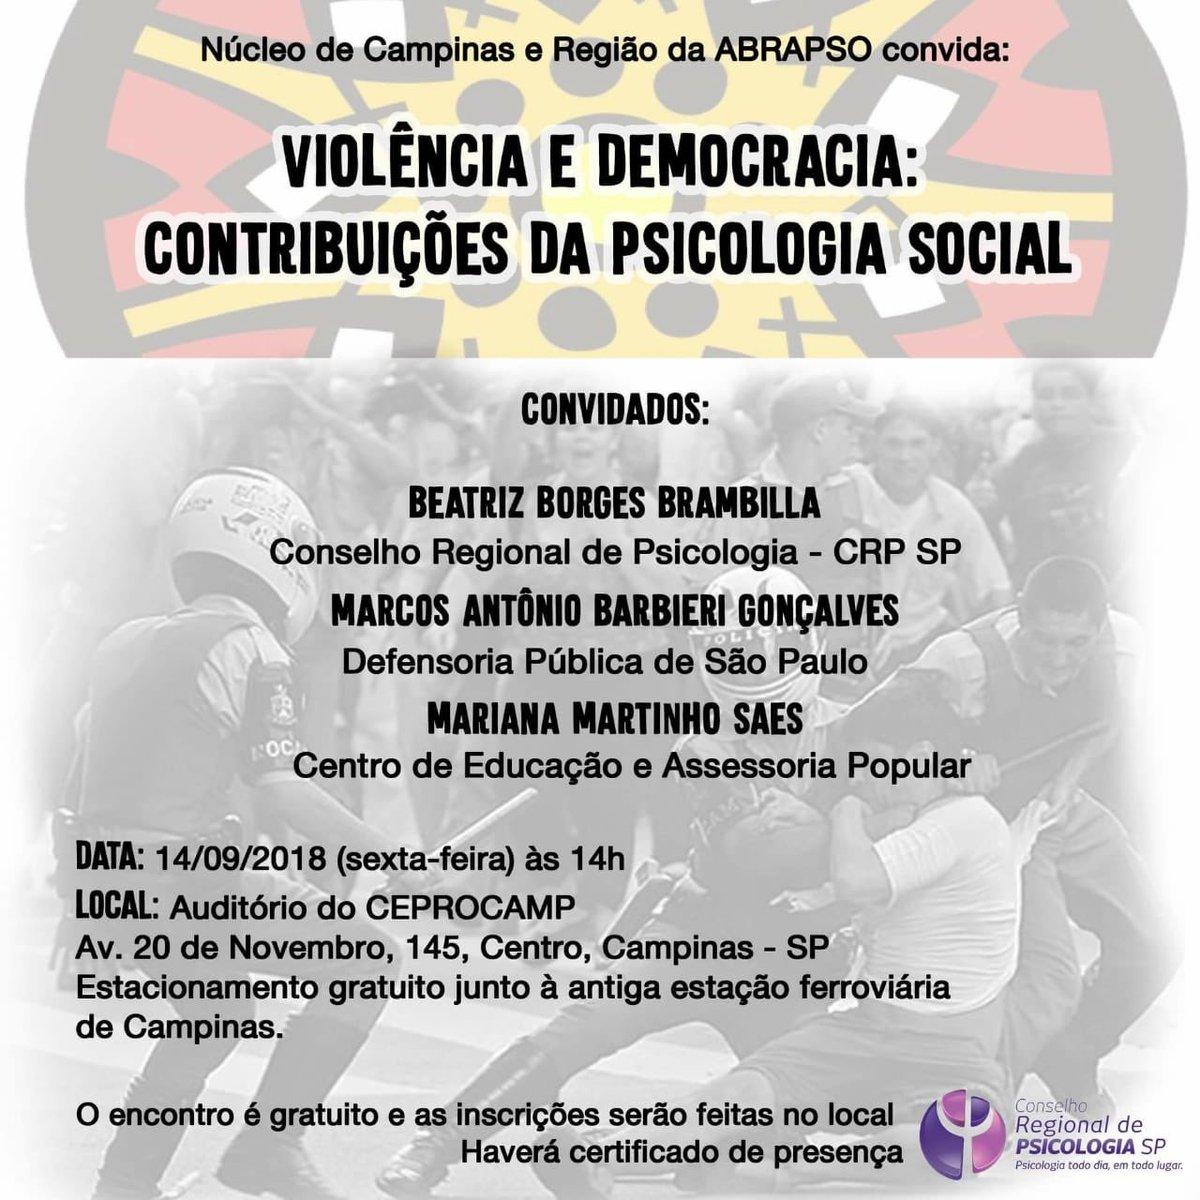 Cristina N. Barros Pimentel/Psicóloga cristinabp psi   Twitter